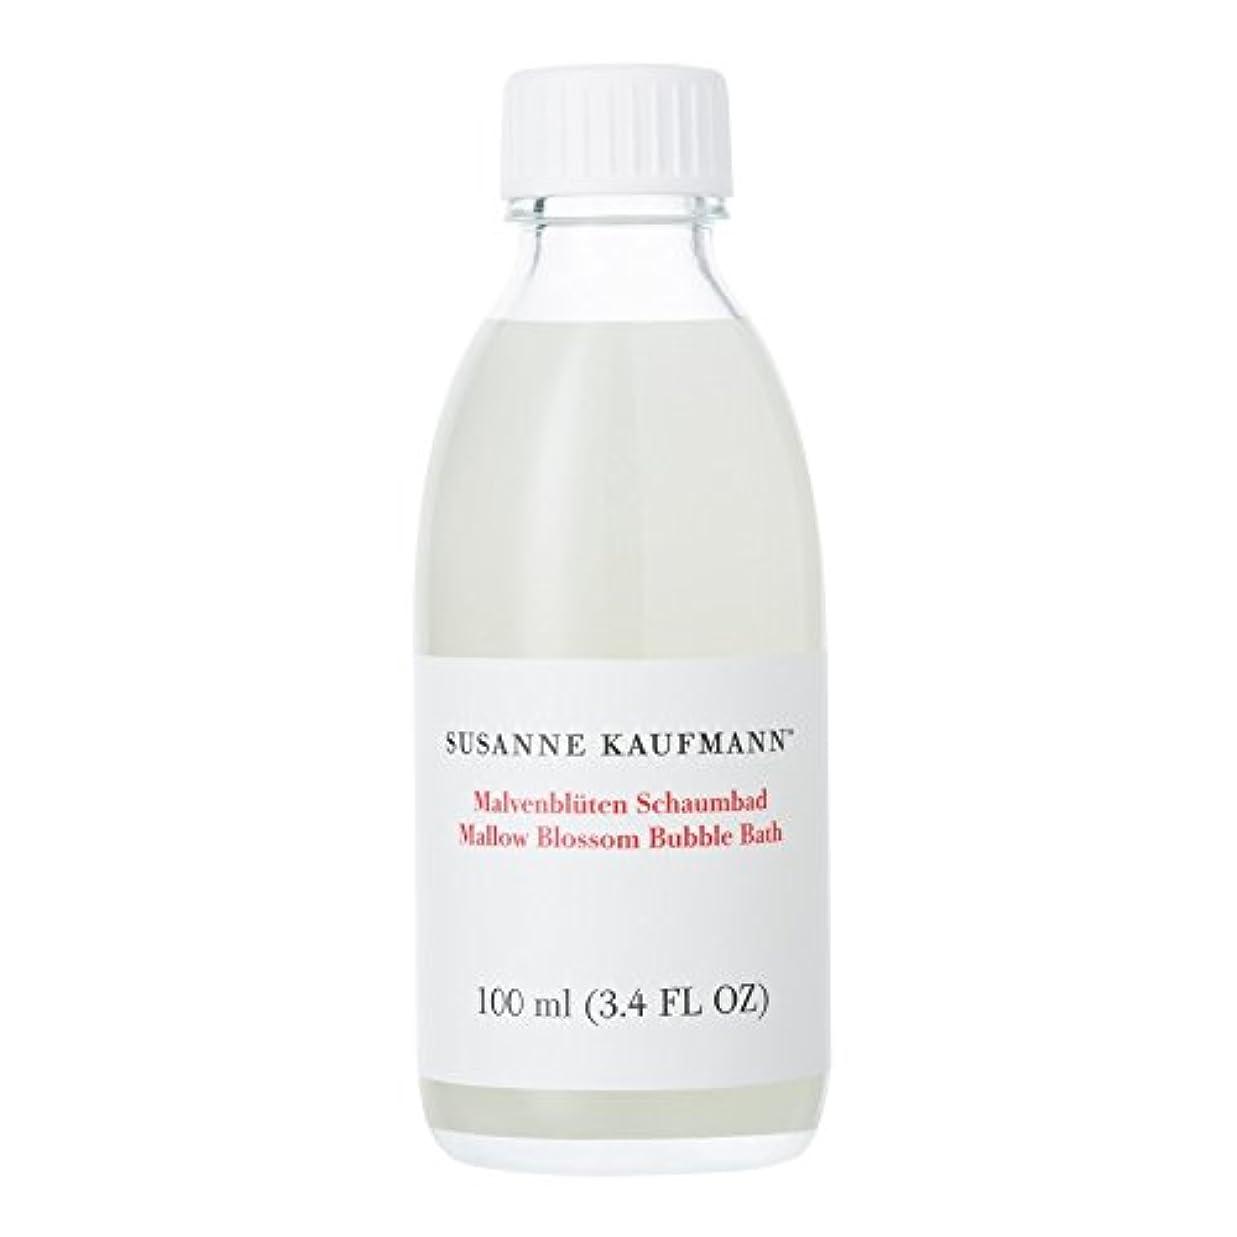 Susanne Kaufmann Mallow Blossom Bath 100ml - スザンヌカウフマンアオイ花バス100ミリリットル [並行輸入品]